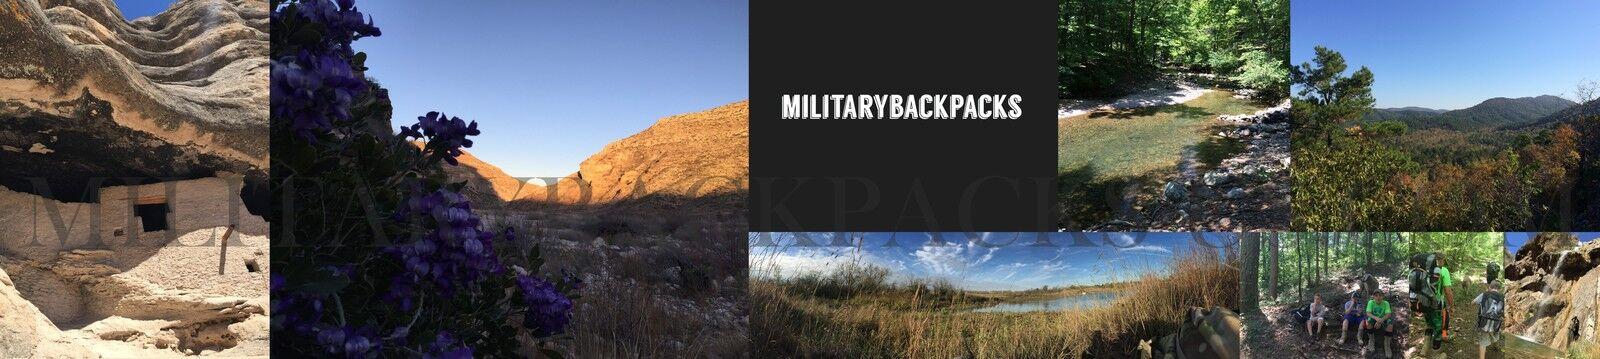 MilitaryBackpacks-US